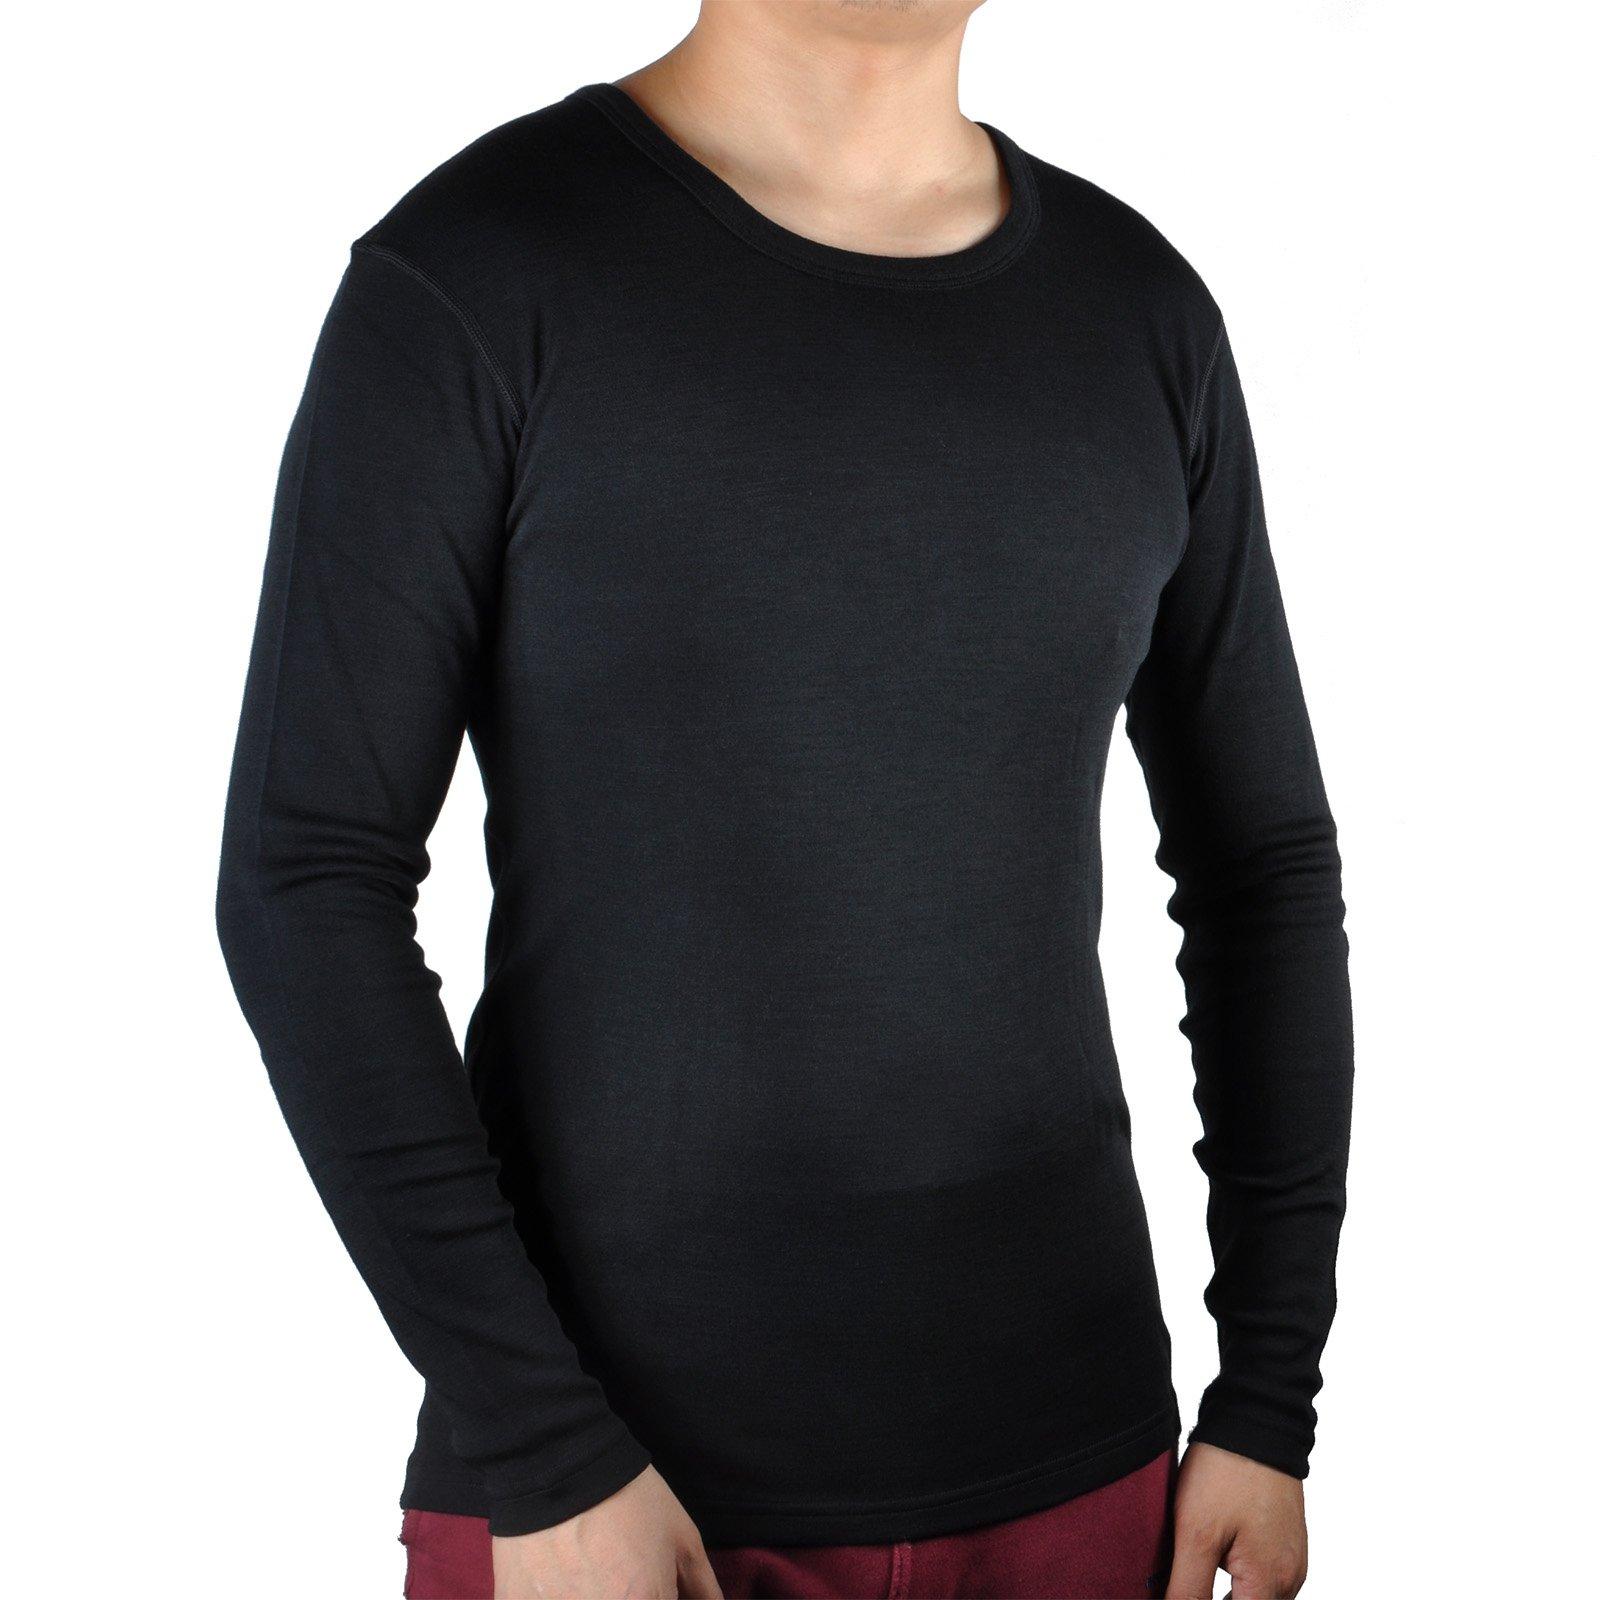 100% Merino Wool Men's Midweight Base Layer Thermal Underwear Tops Long Sleeve Crew (XL, Black)